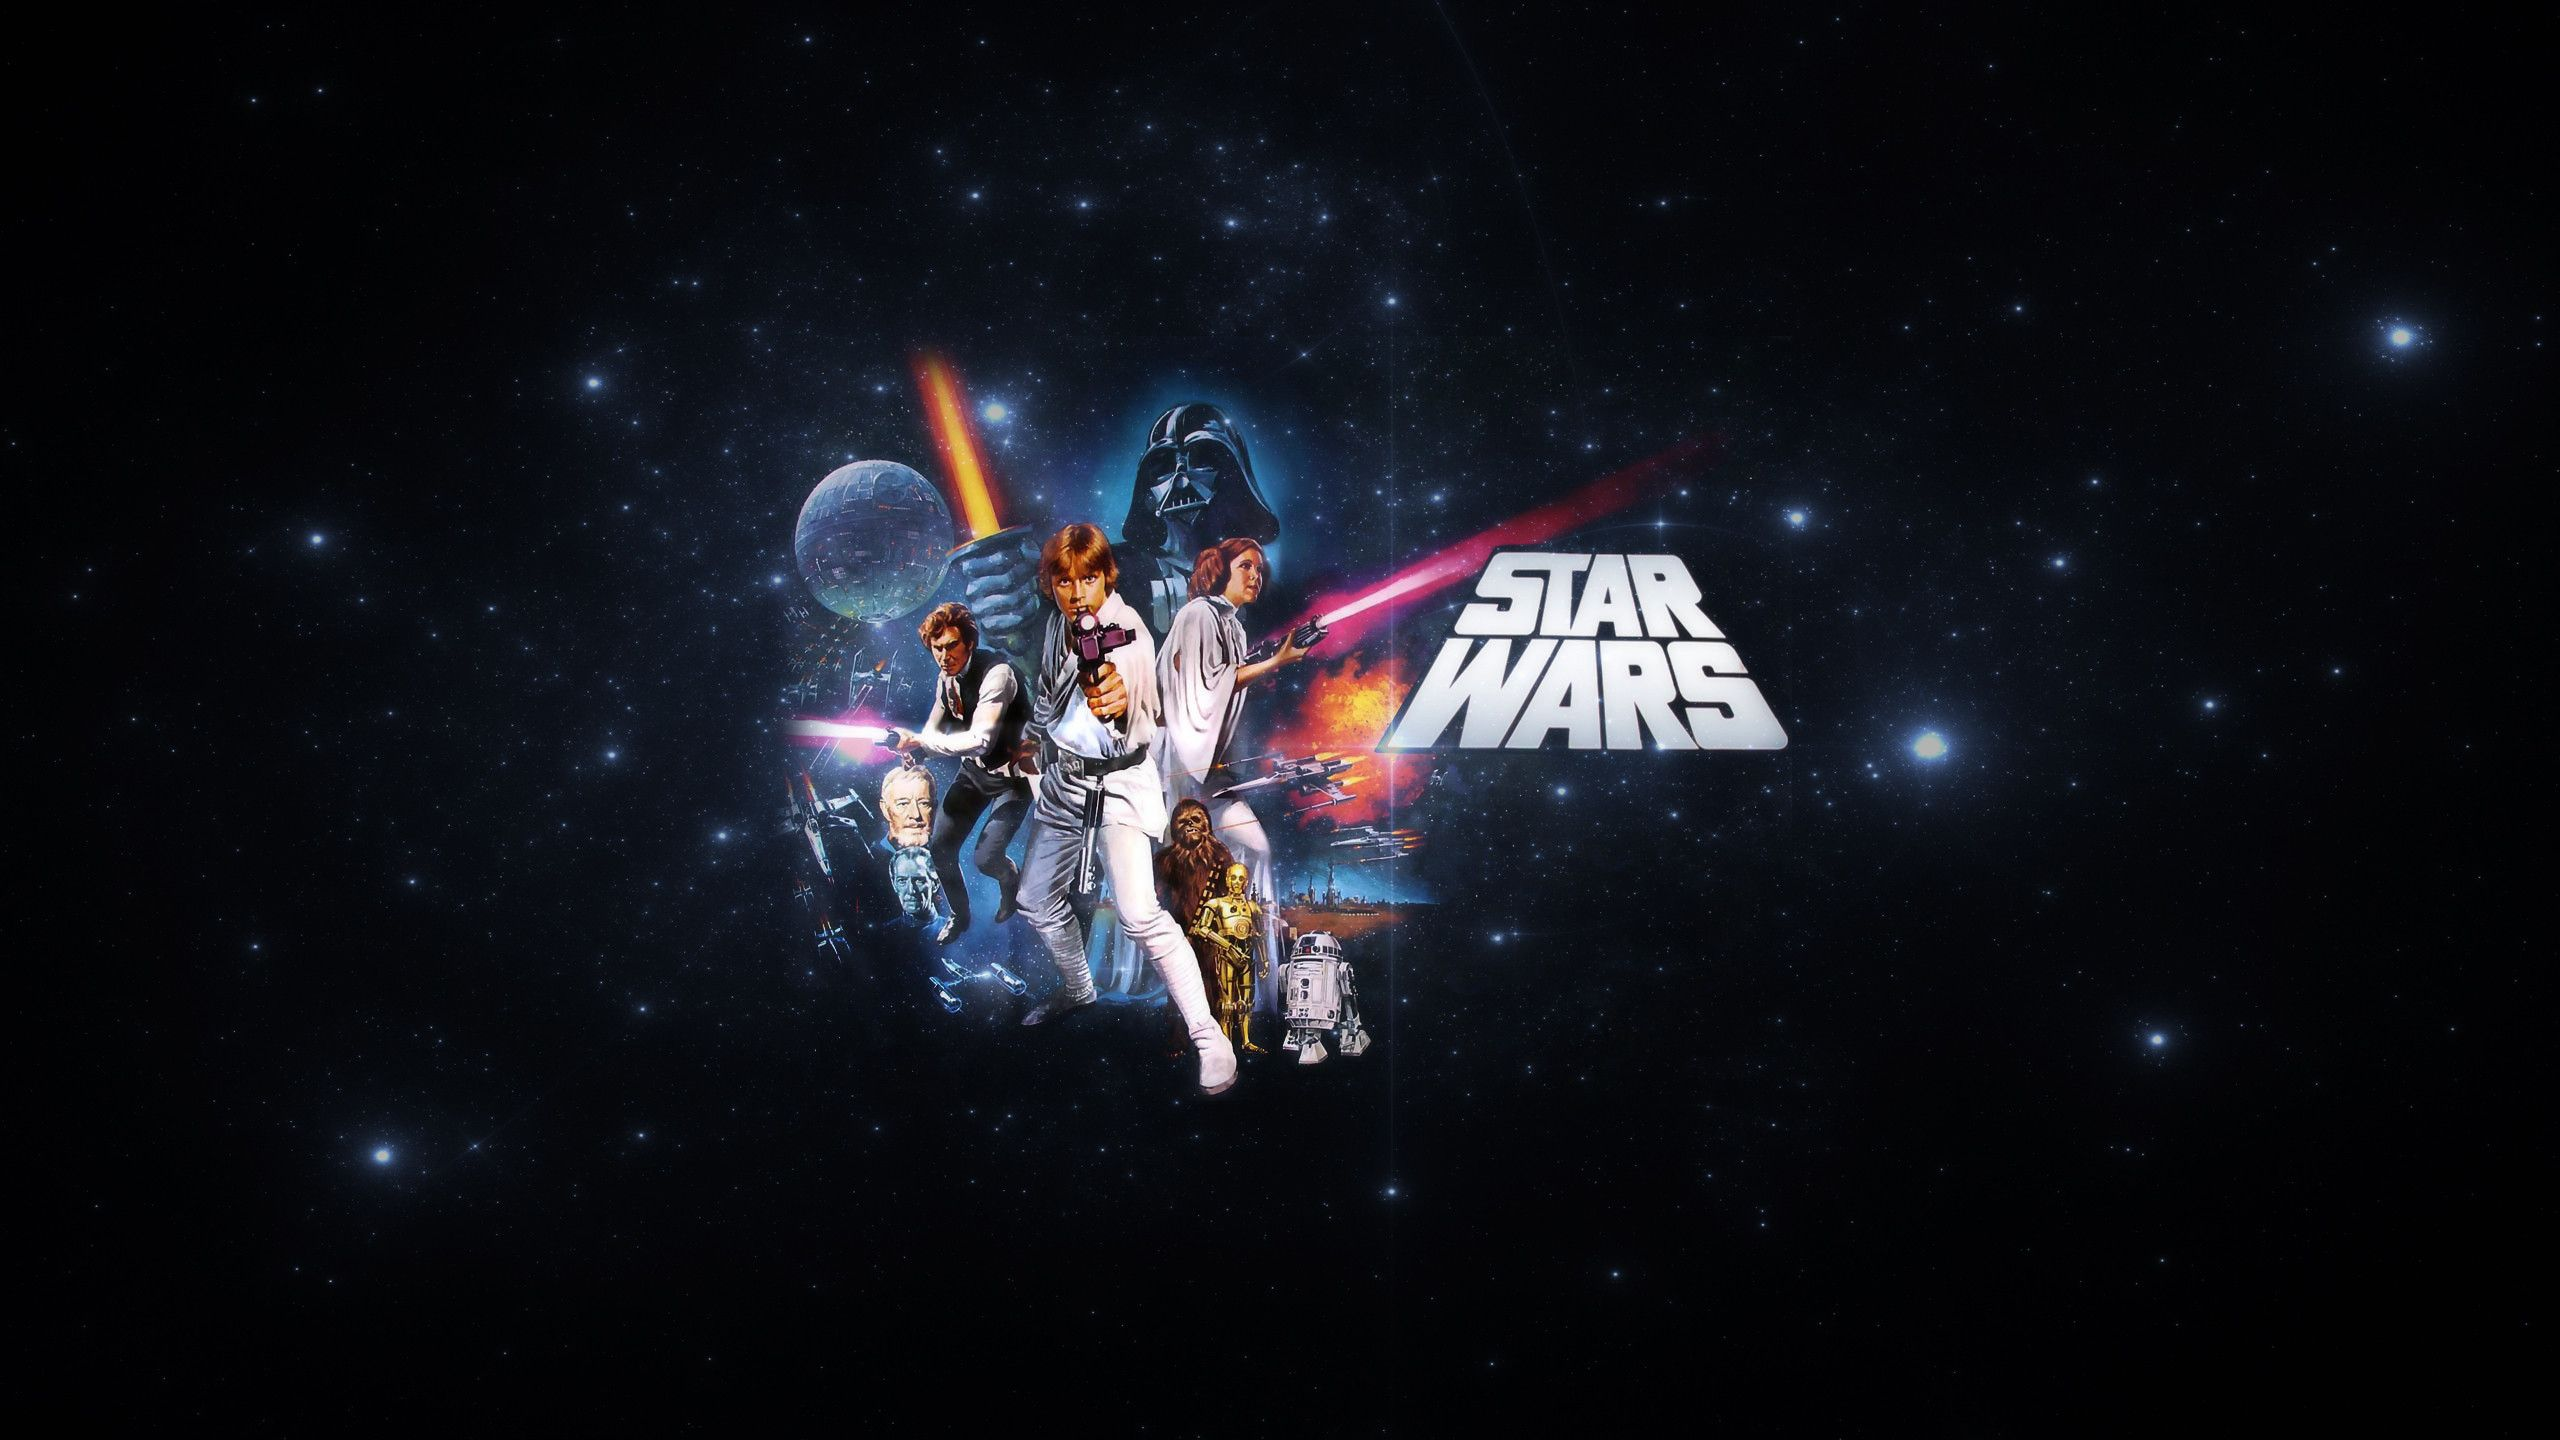 Star Wars Aesthetic Desktop Wallpapers Wallpaper Cave